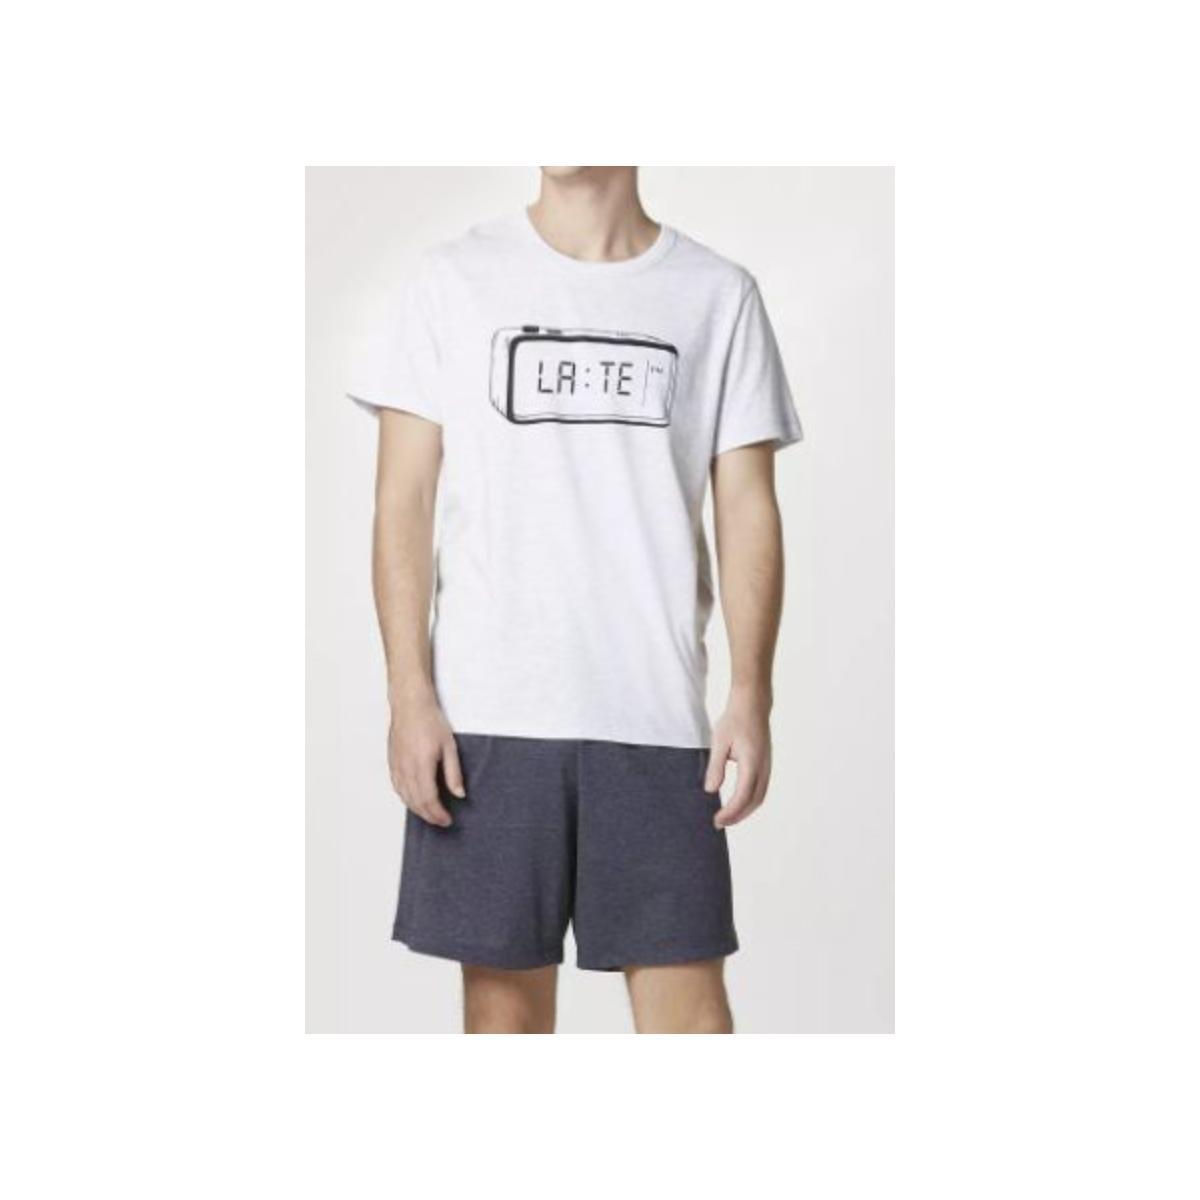 Pijama Masculina Hering 7bzk Md6en Branco